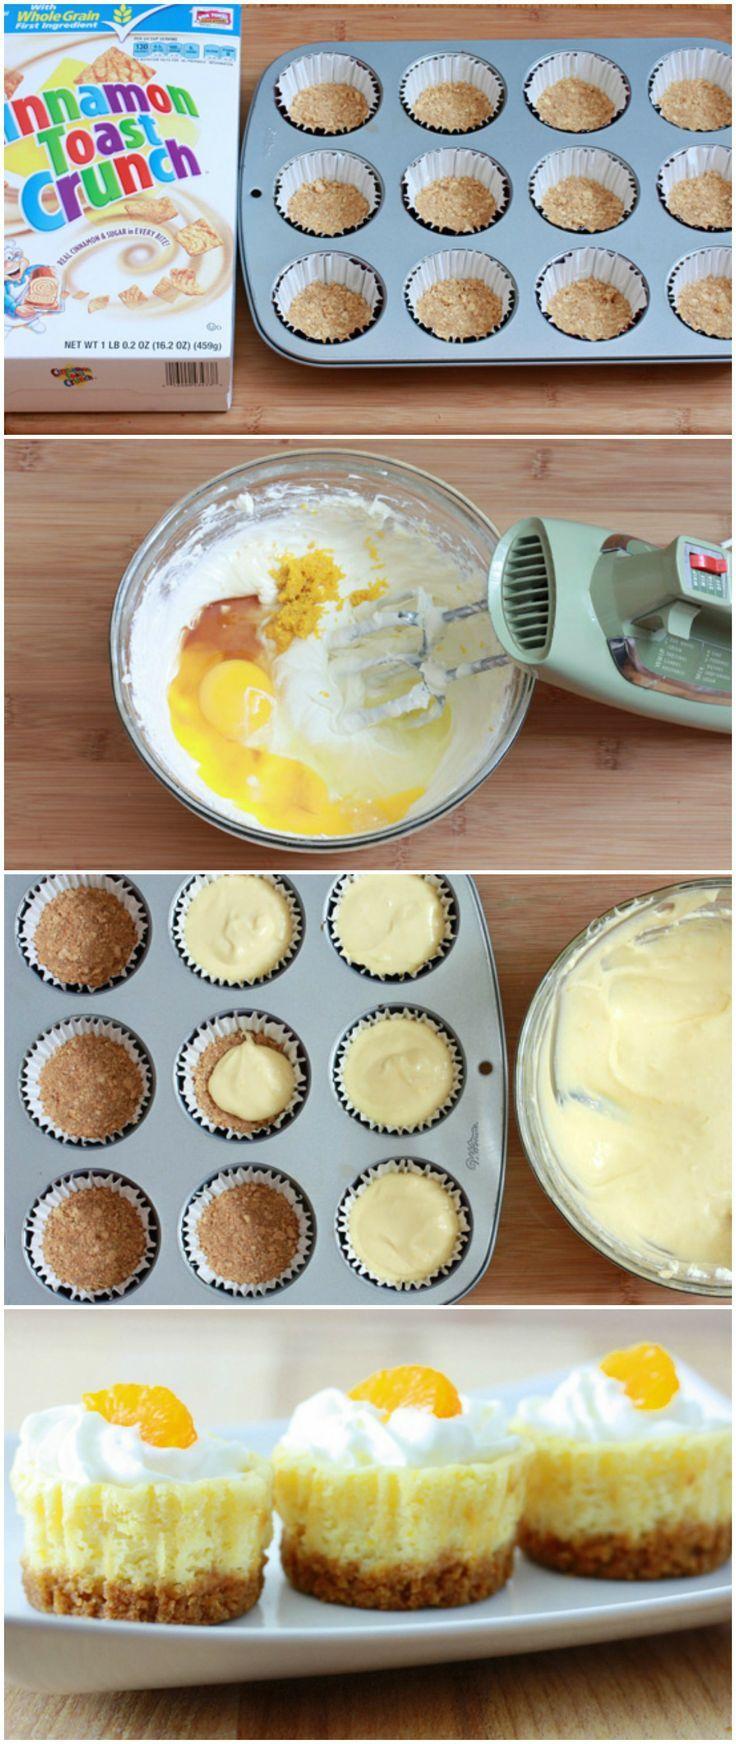 Mandarin cake recipe uk